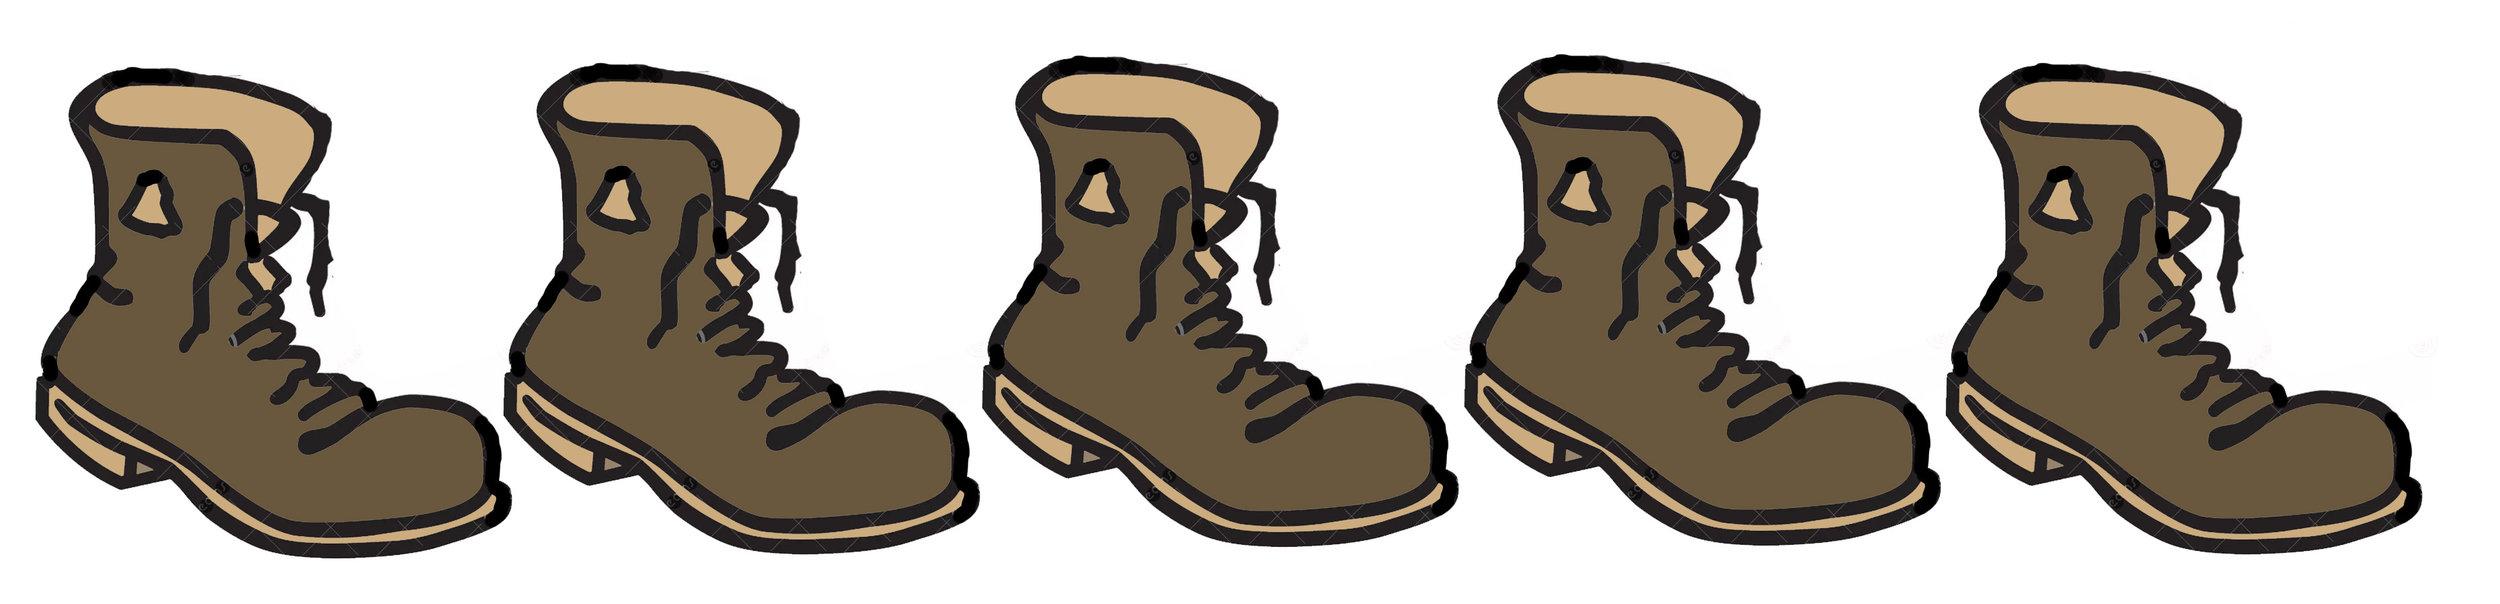 5 boot.jpg